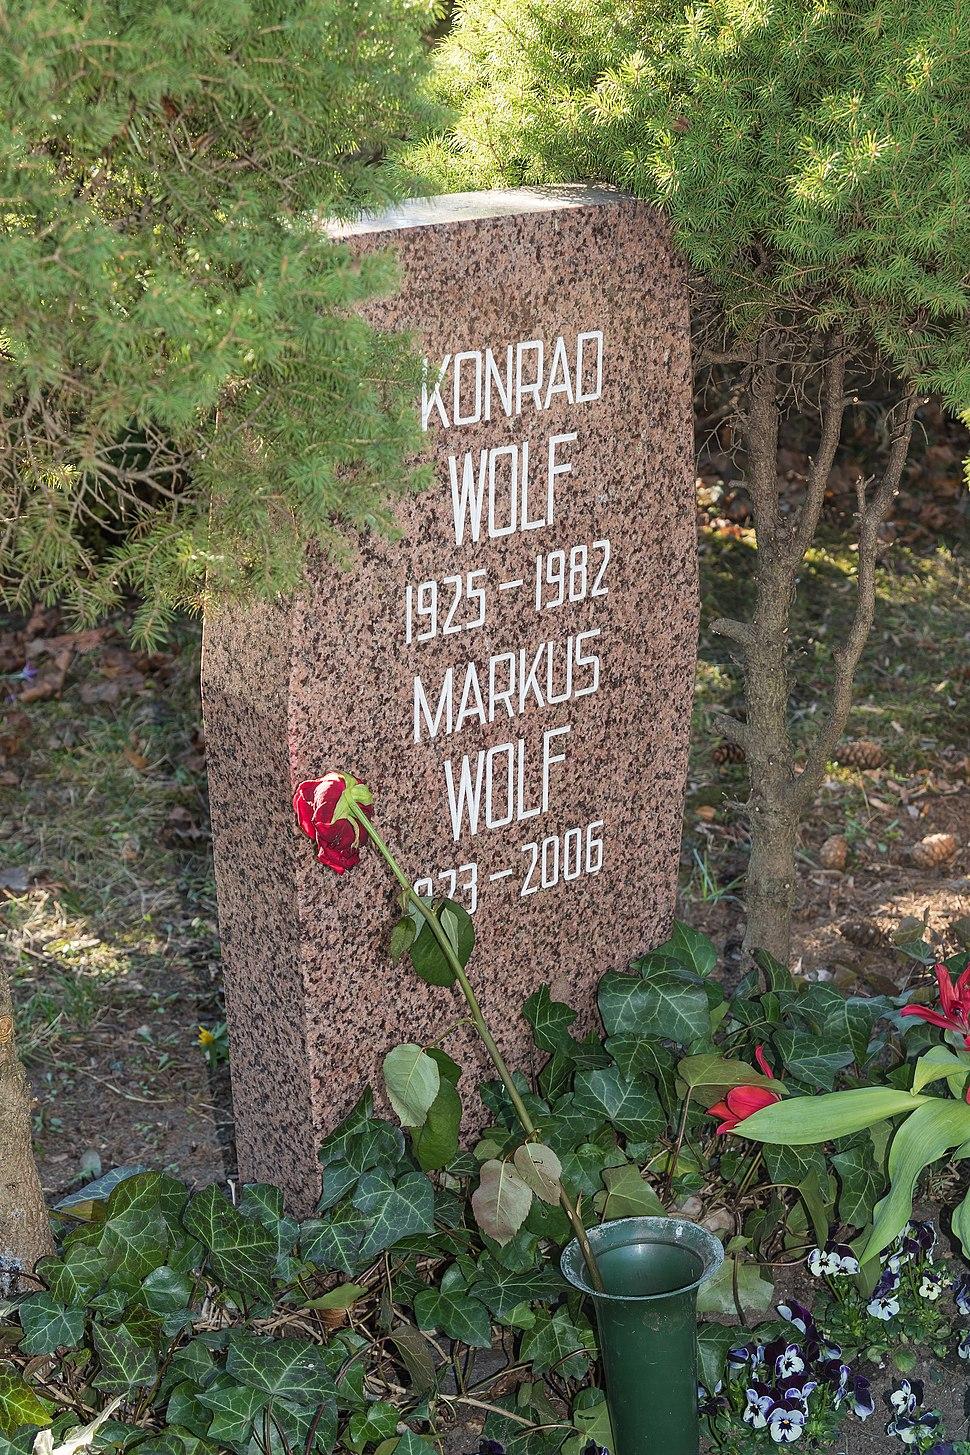 B-Friedrichsfelde Zentralfriedhof 03-2015 img33 Konrad Wolf